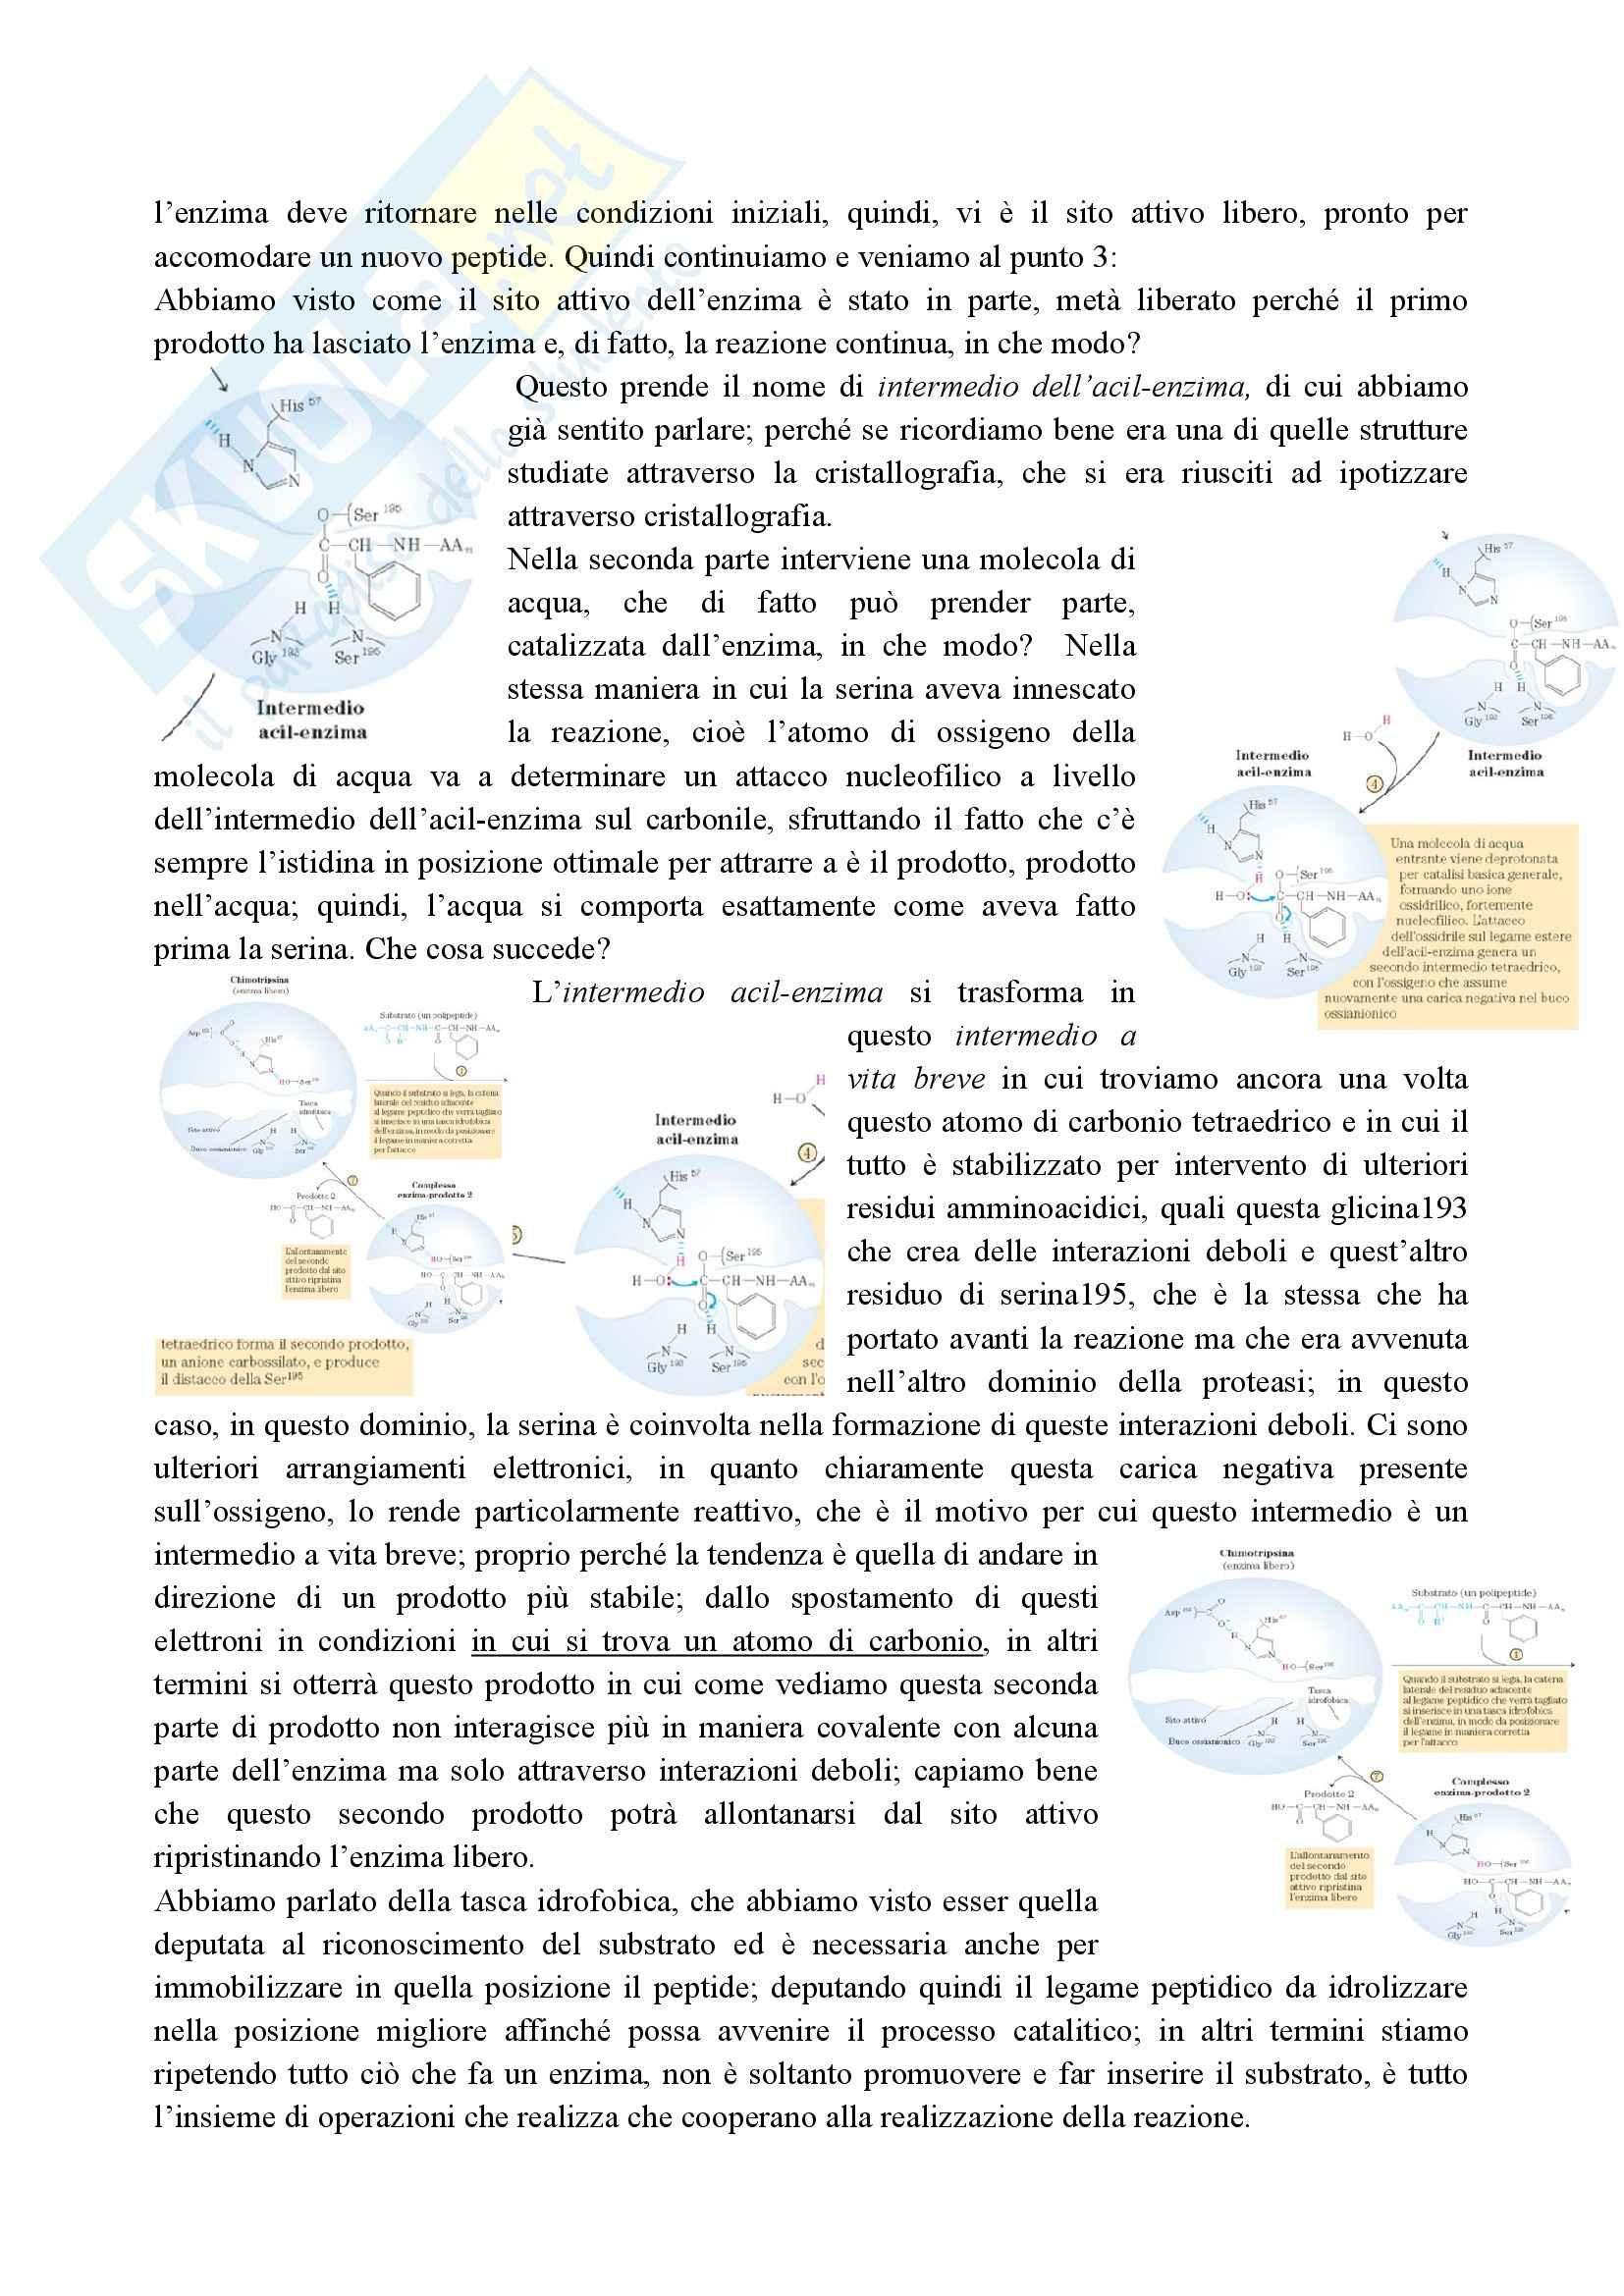 Enzimologia - catalisi enzimatica Pag. 2